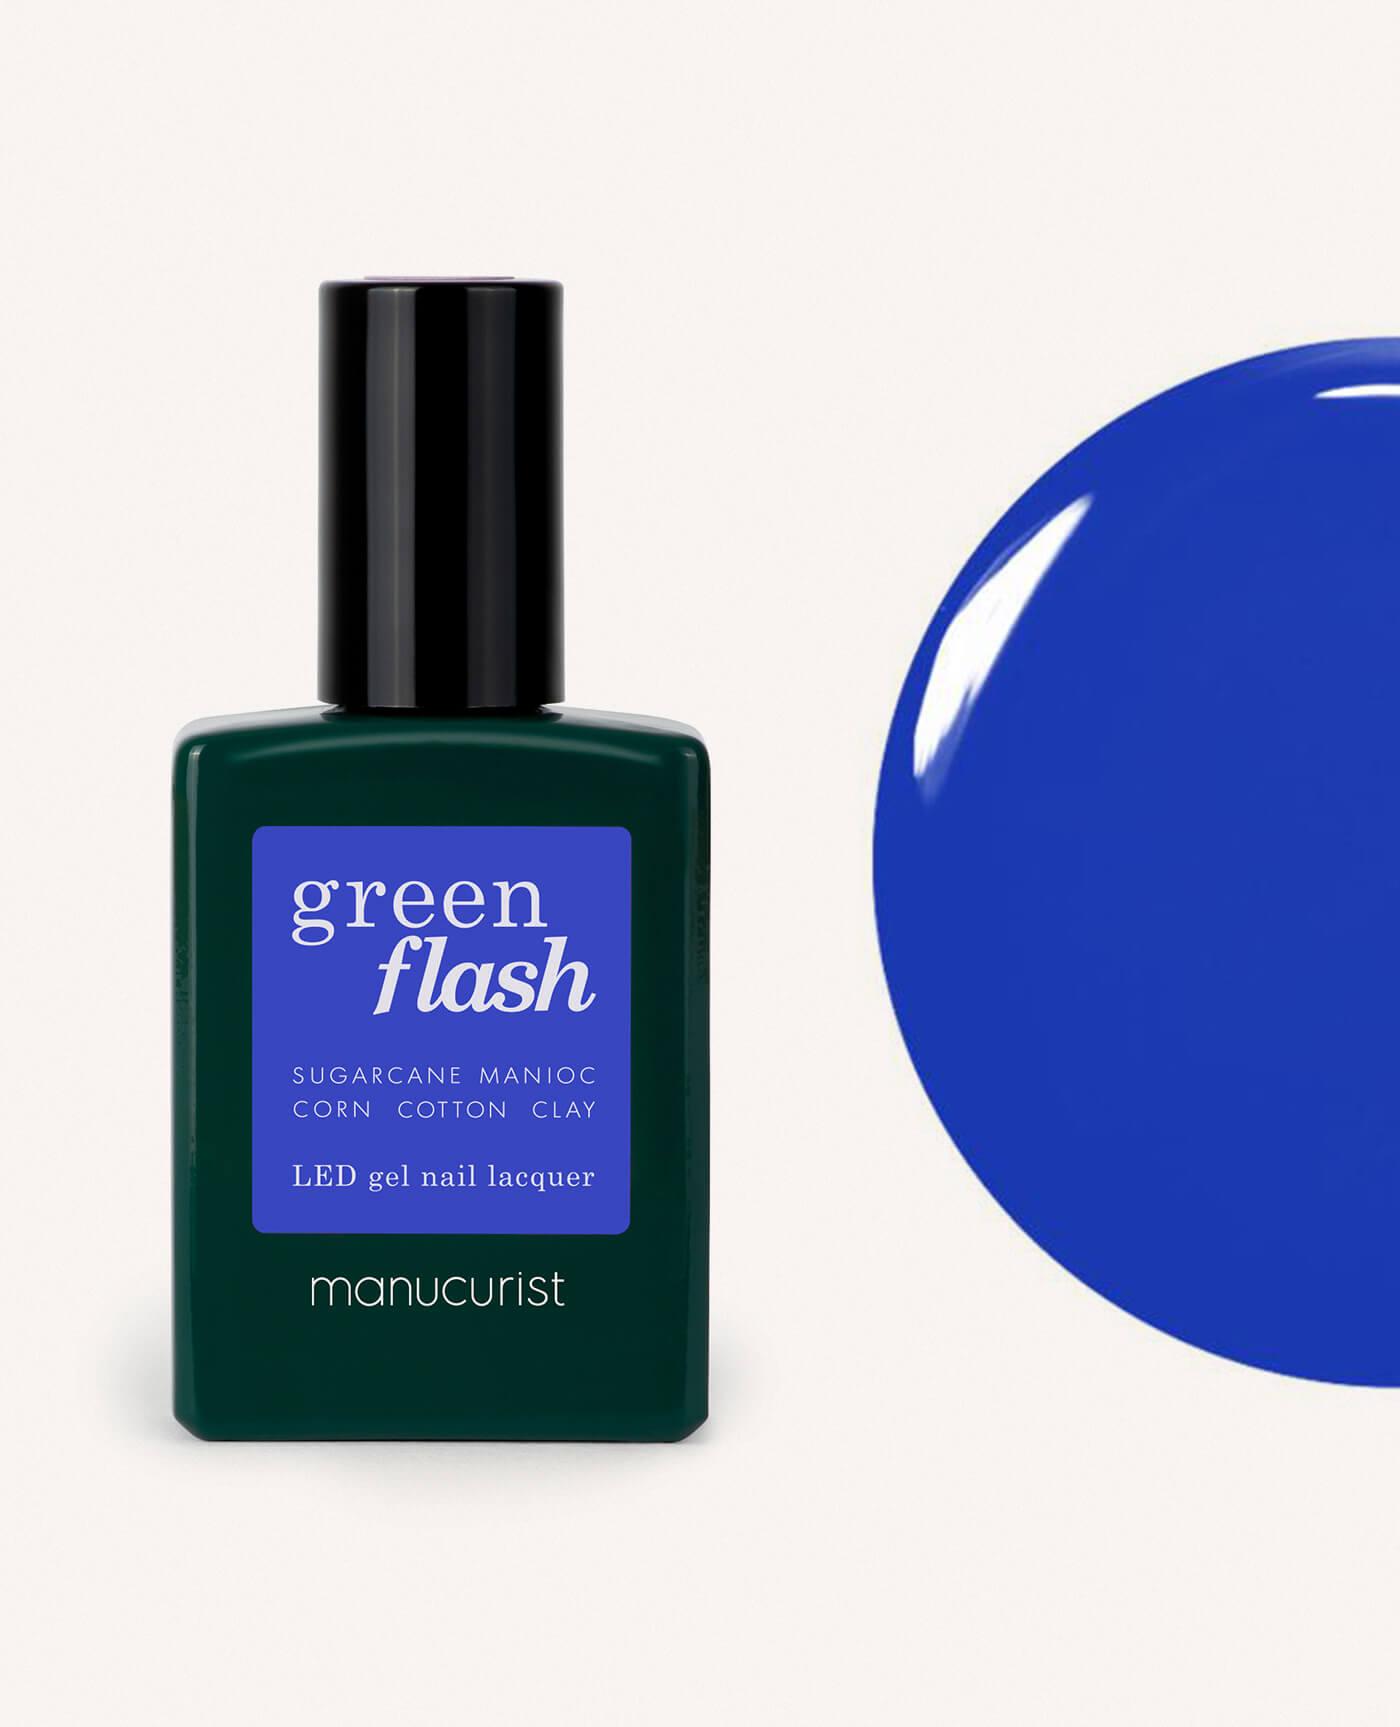 vernis semi permanent green flash de la marque Manucurist de couleur bleu electrique ultra marine